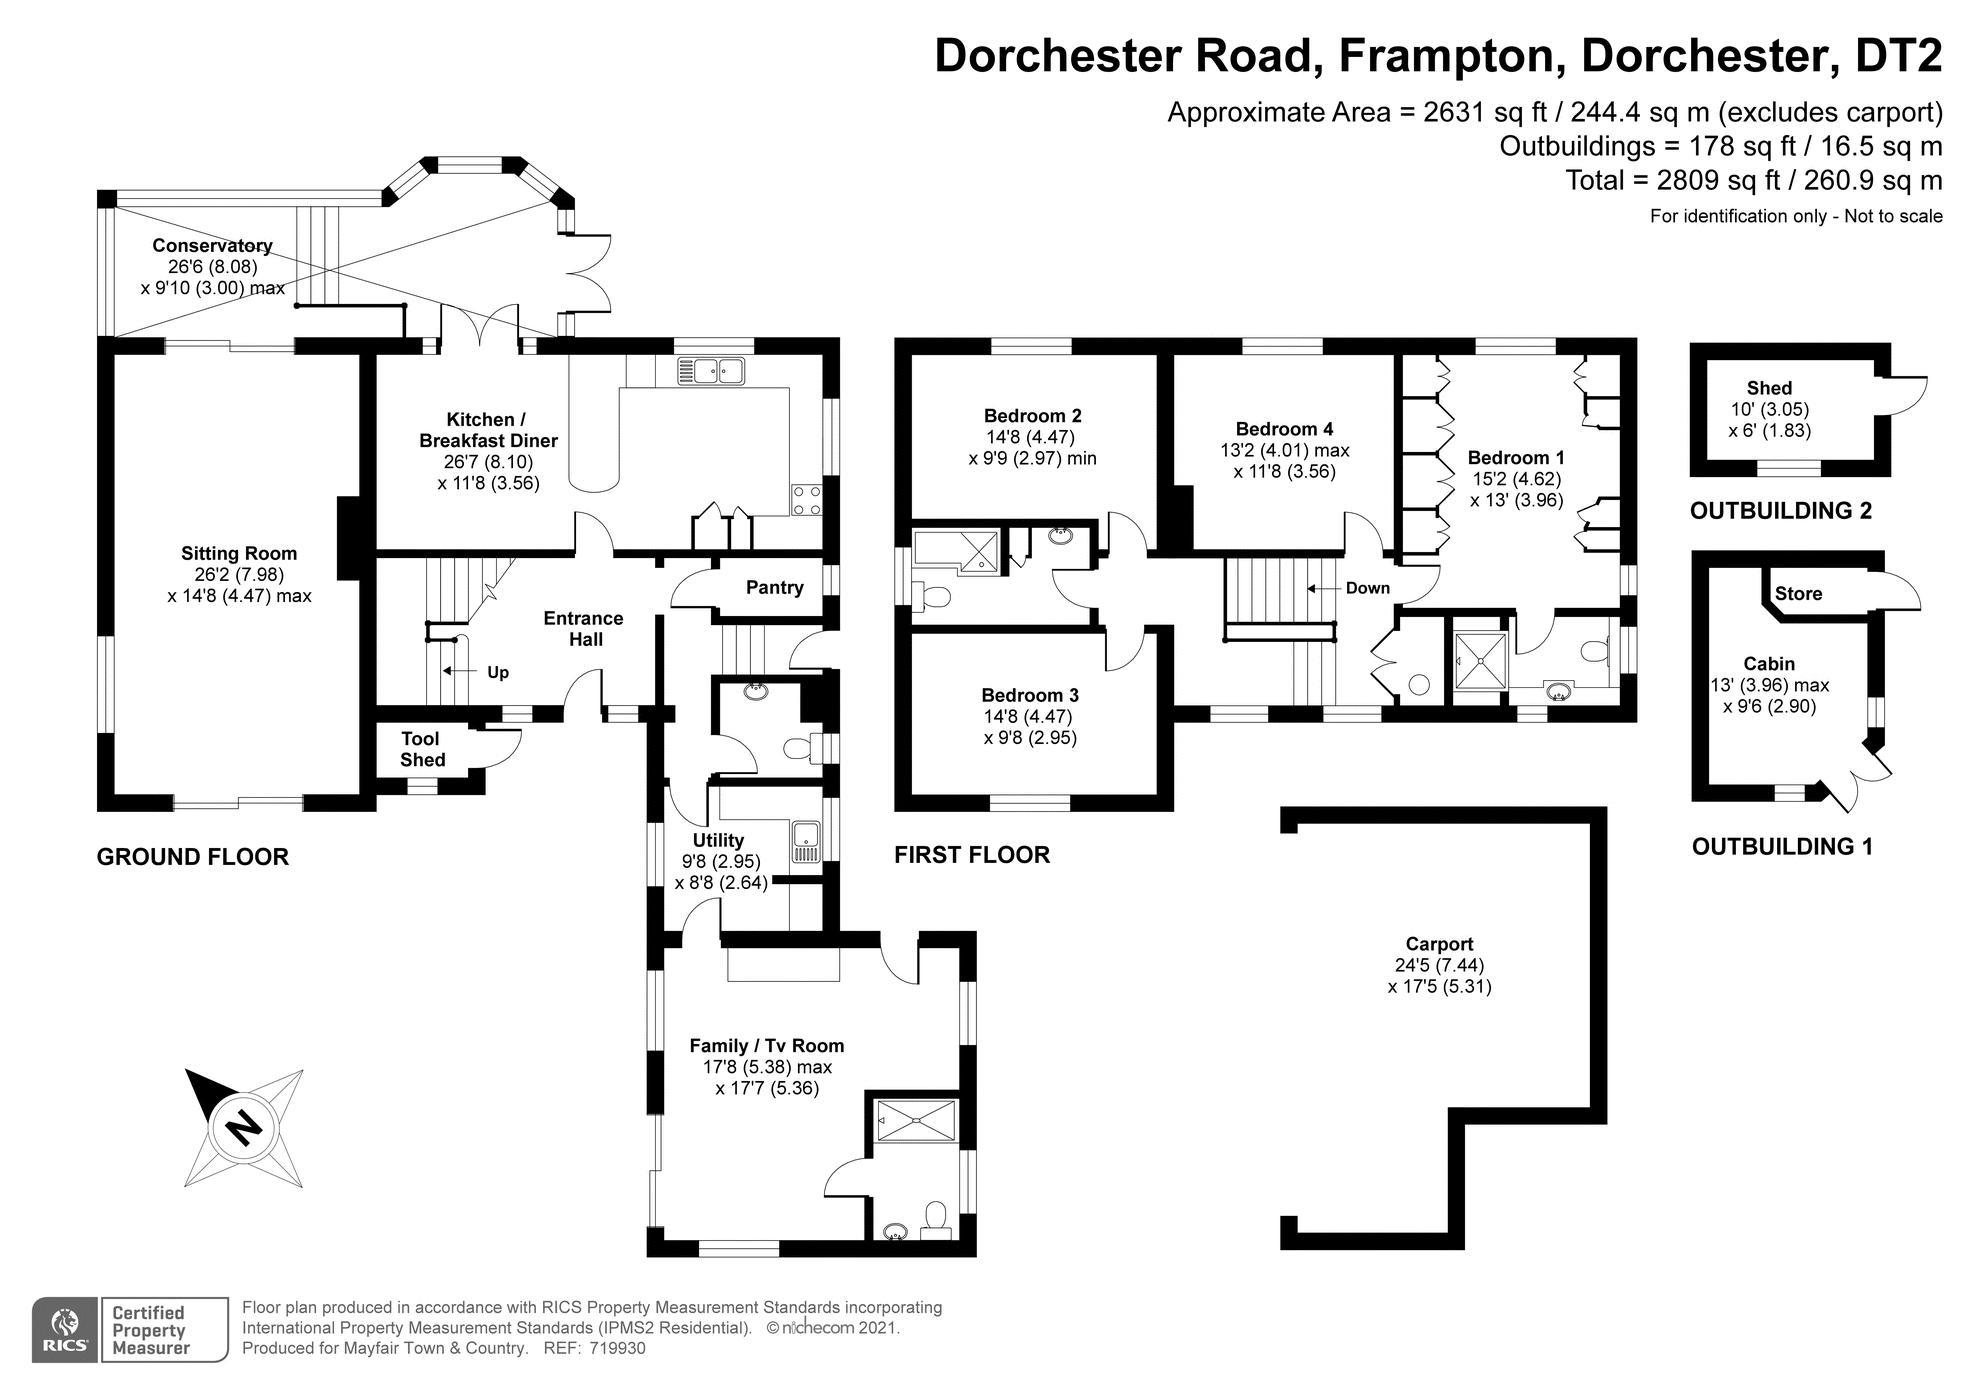 Dorchester Road Frampton